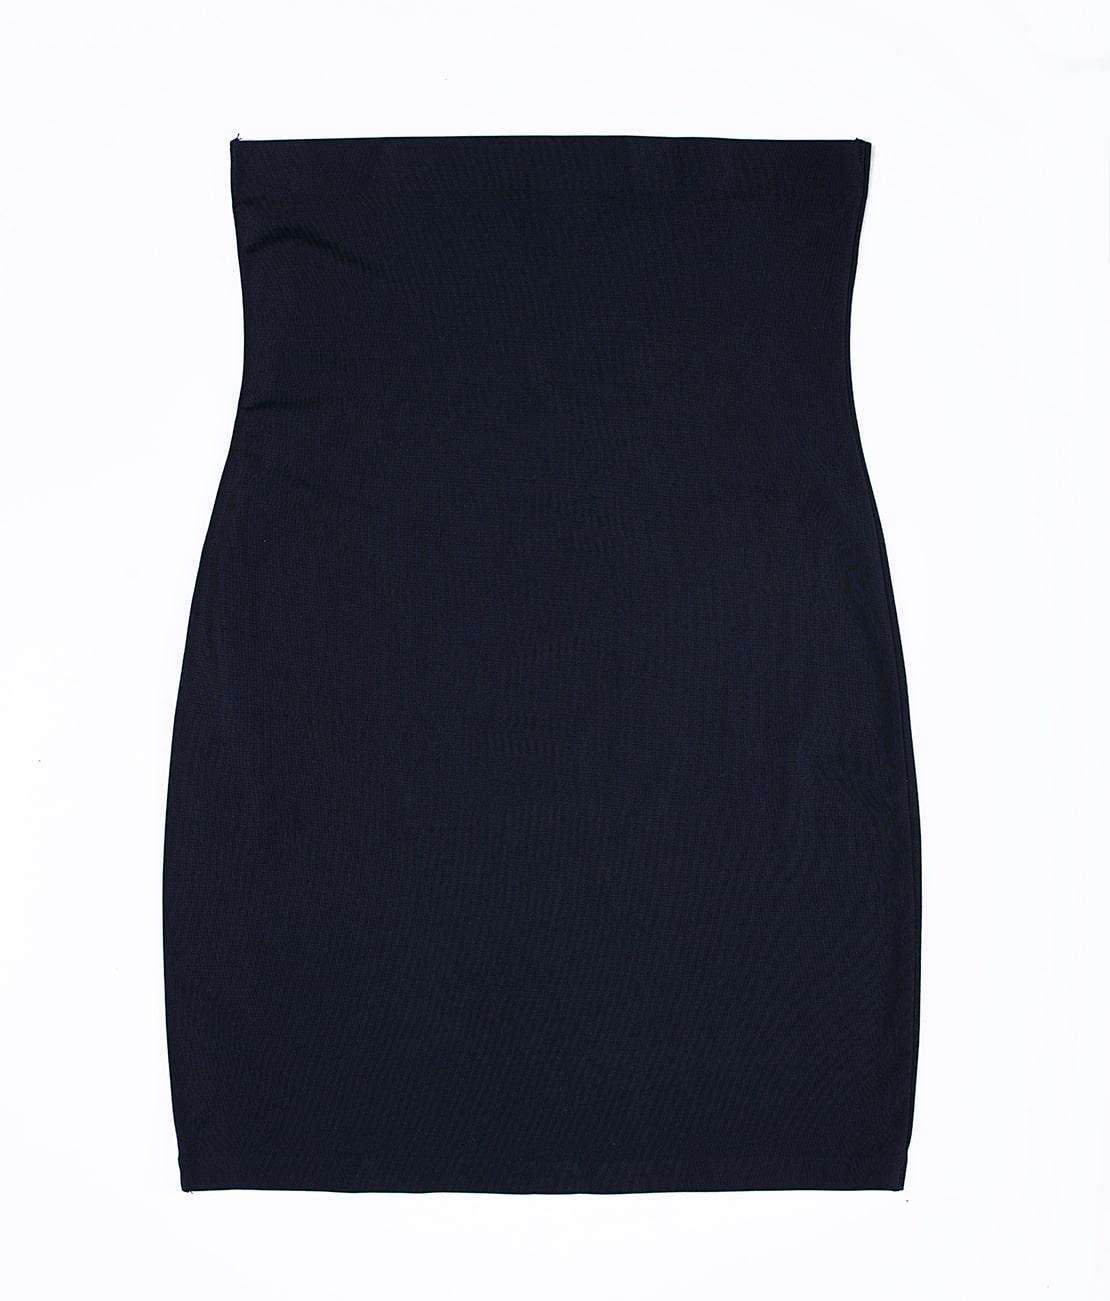 Fond de Robe Gainant Noir